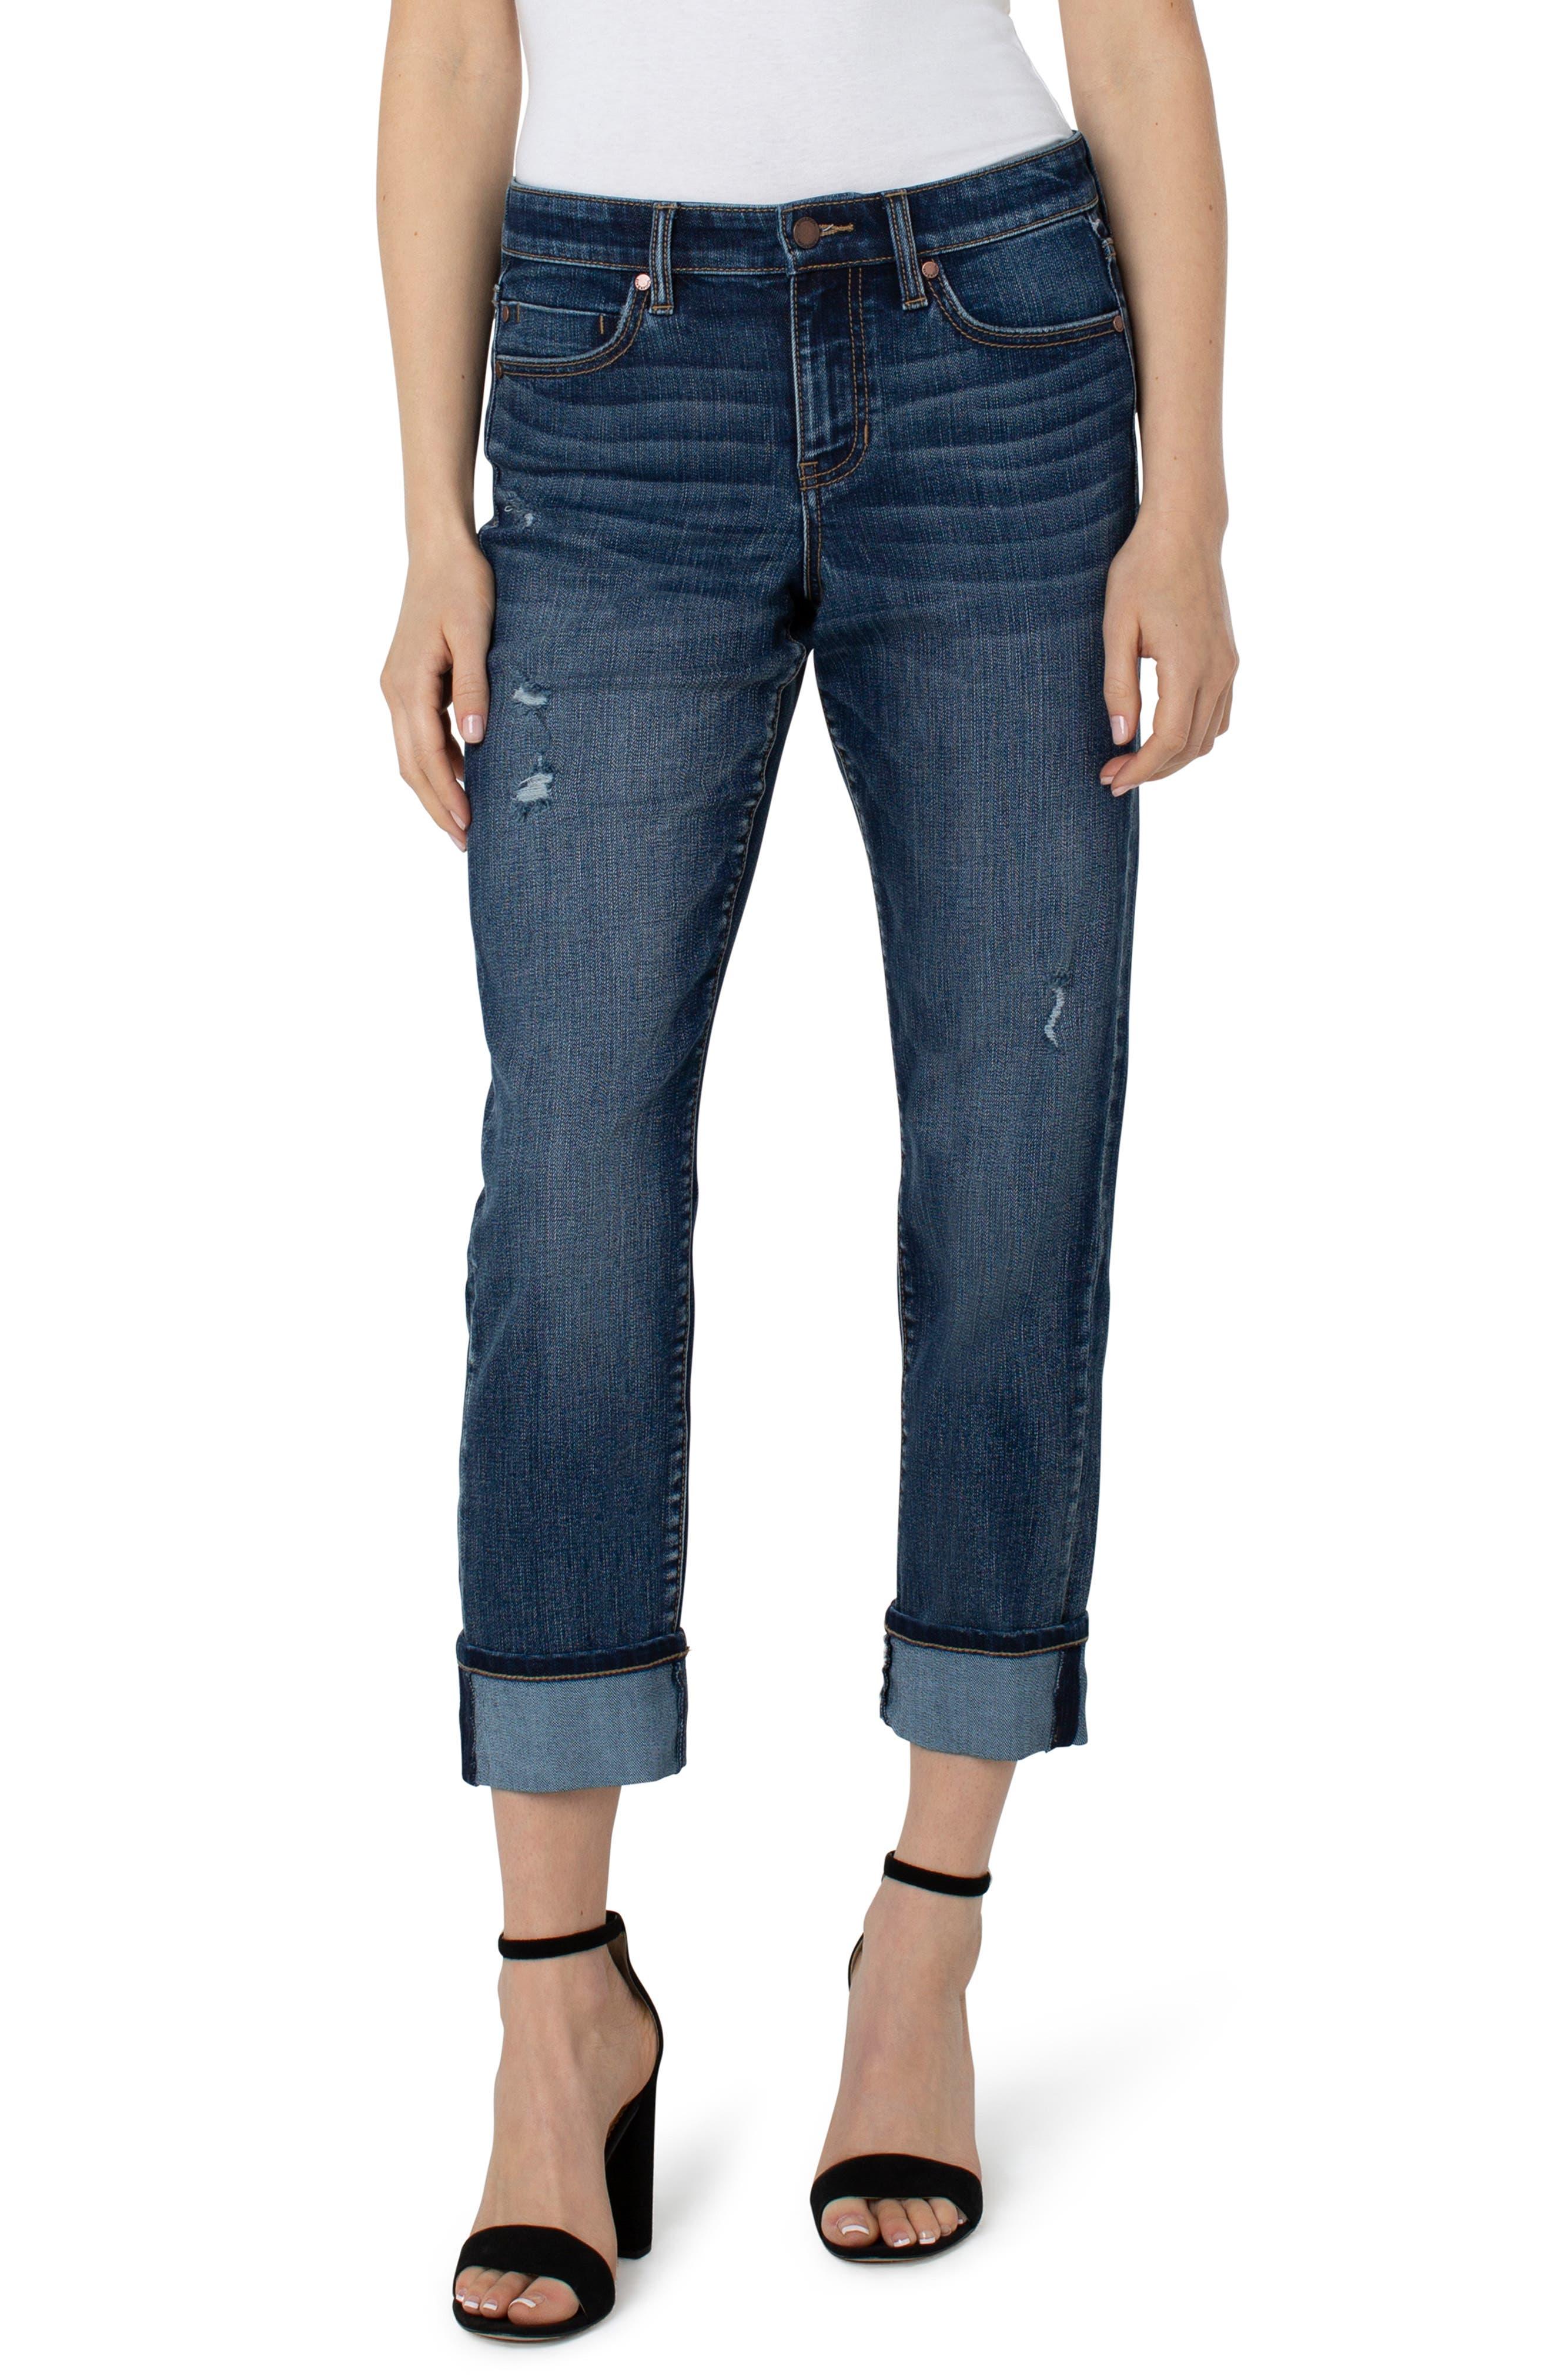 Marley High Waist Ankle Girlfriend Jeans